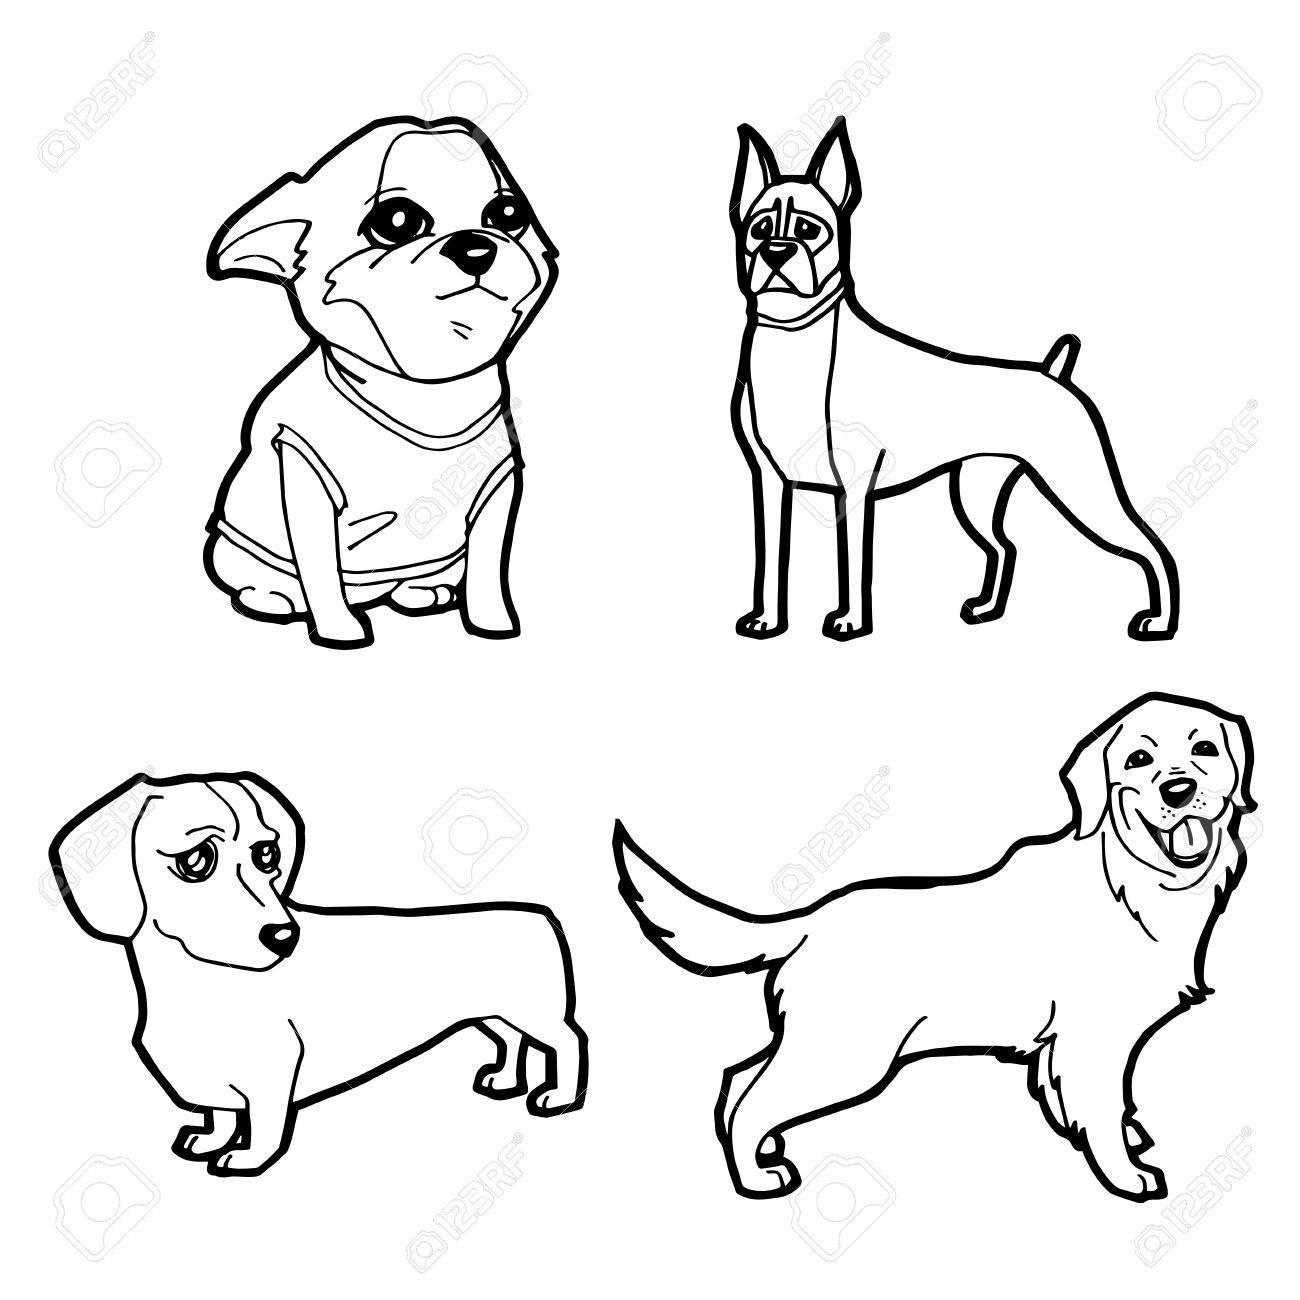 Set Of Cartoon Cute Dog Coloring Page Vector Illustration Royalty ...